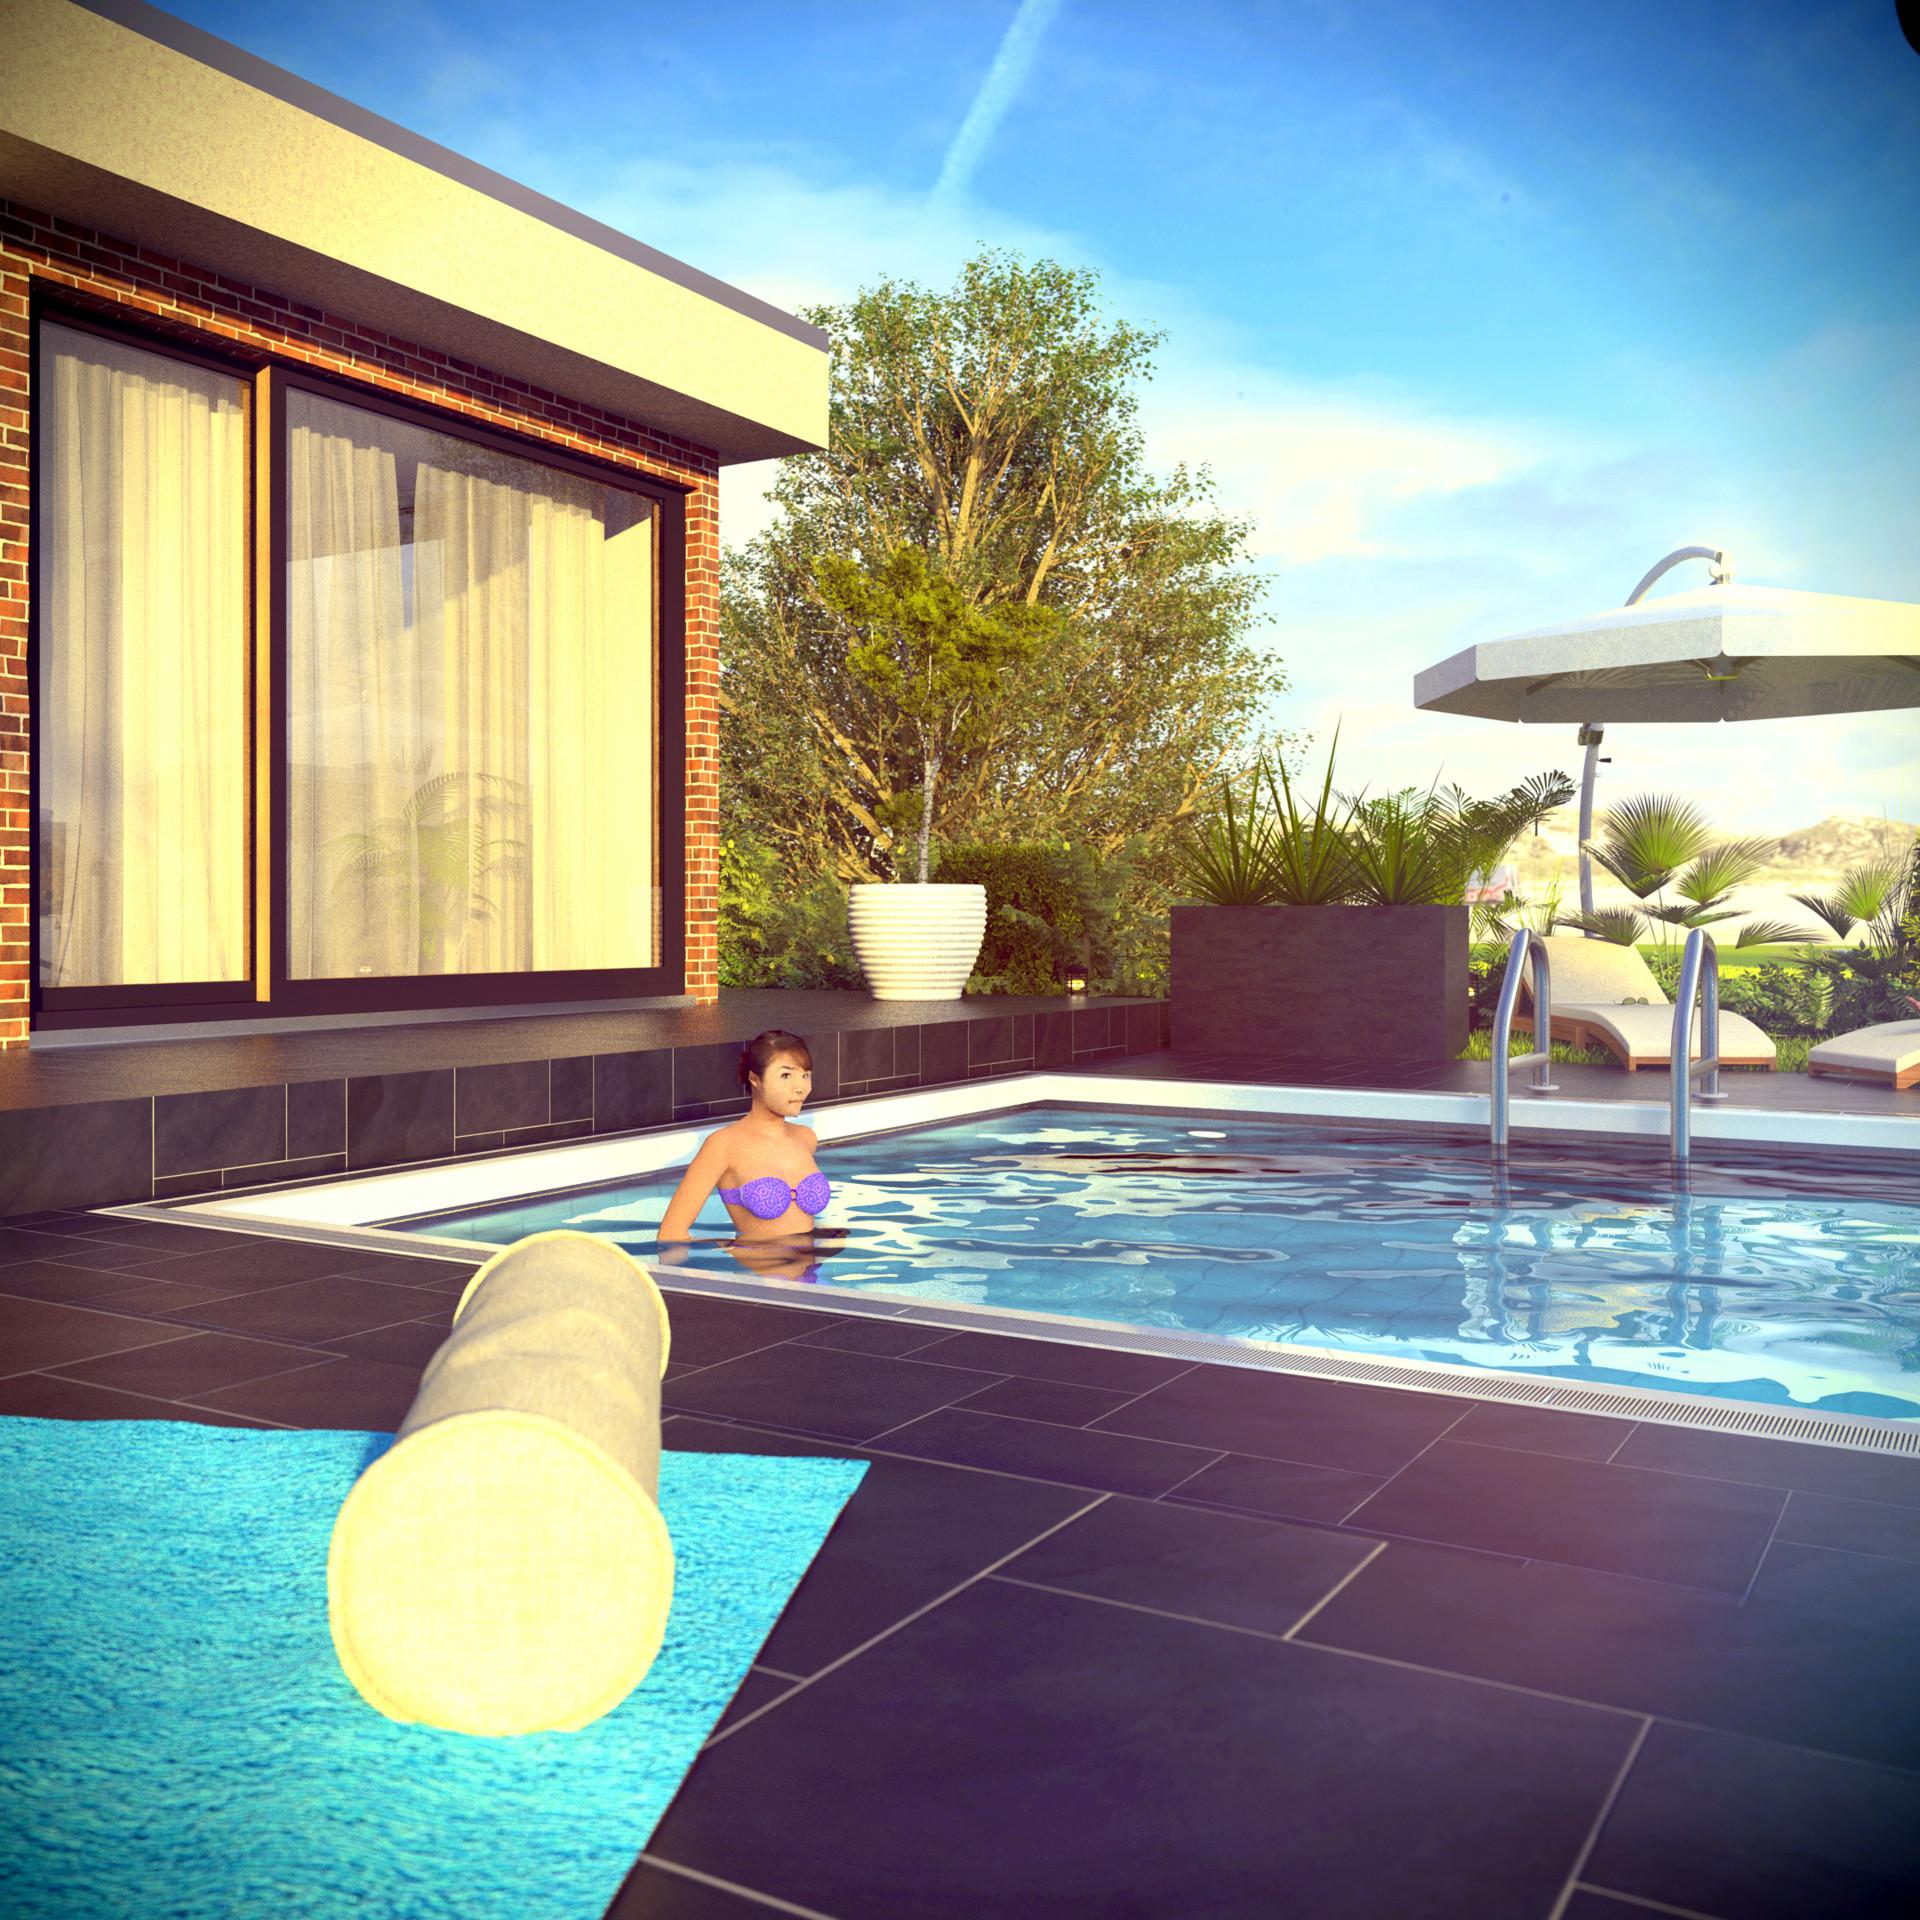 Duane kemp 16 bungalow poolside scene 63 lumina rise